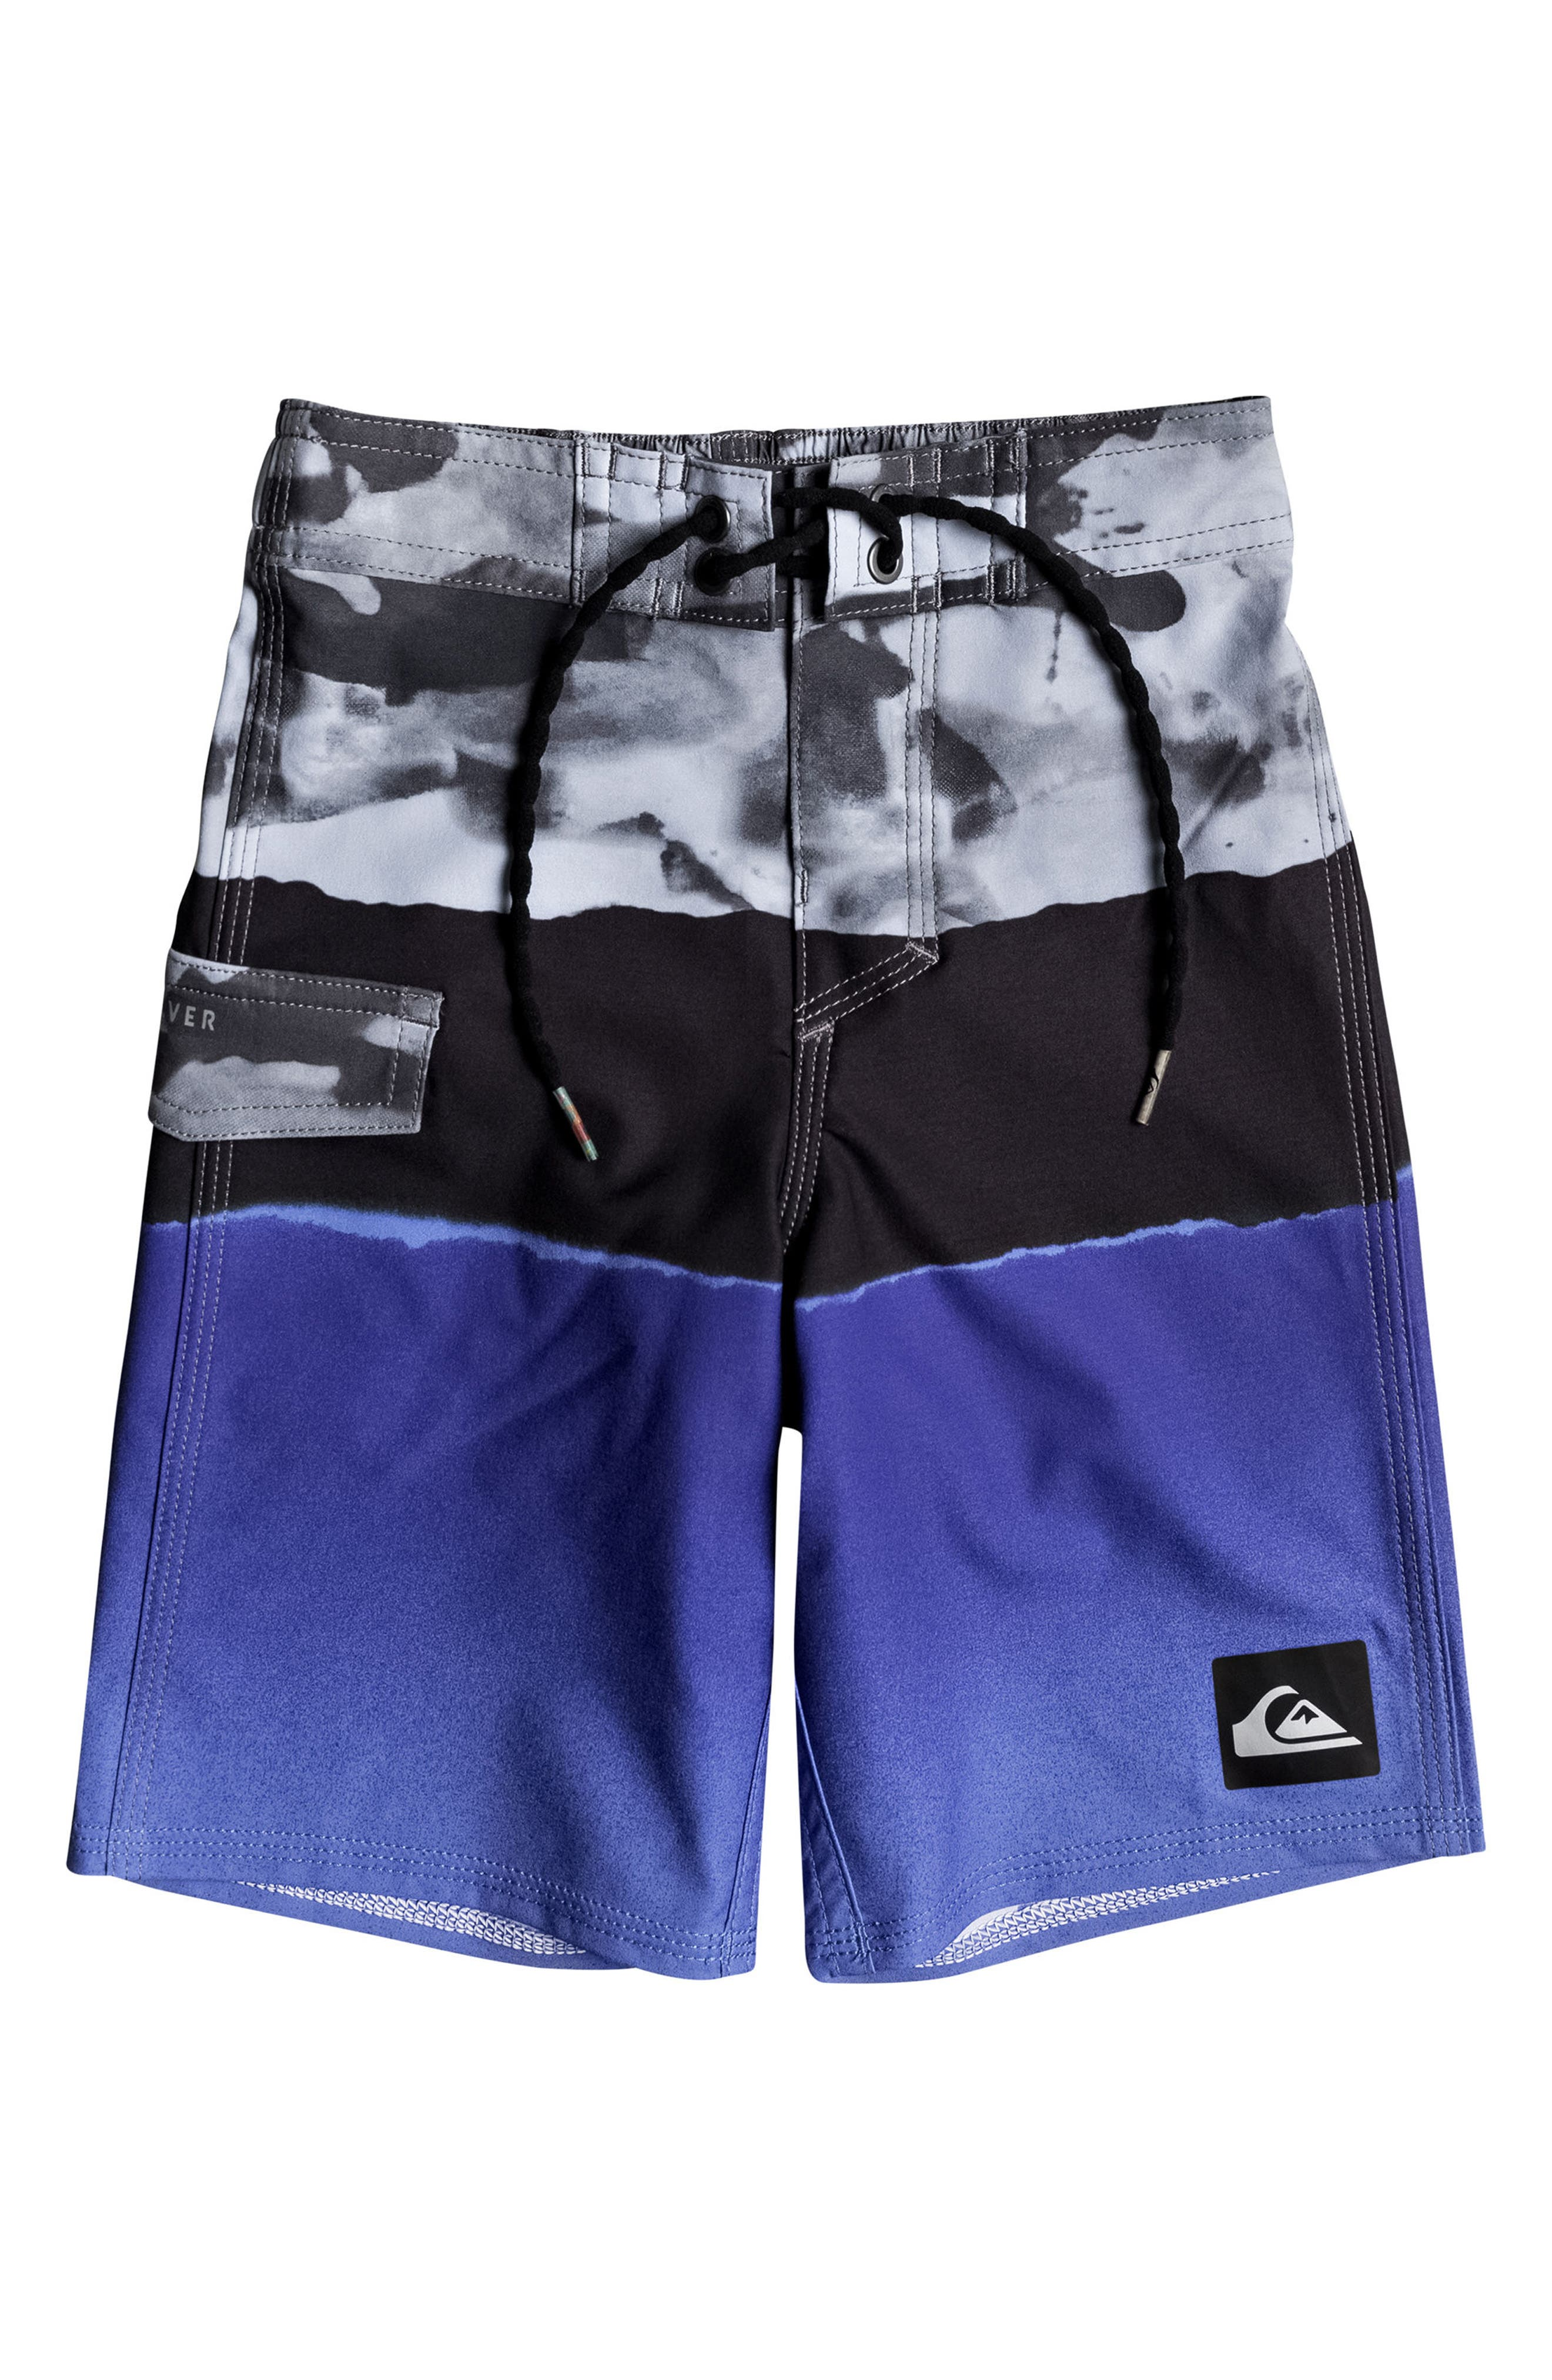 QUIKSILVER Blocked Resin Camo Board Shorts, Main, color, 421